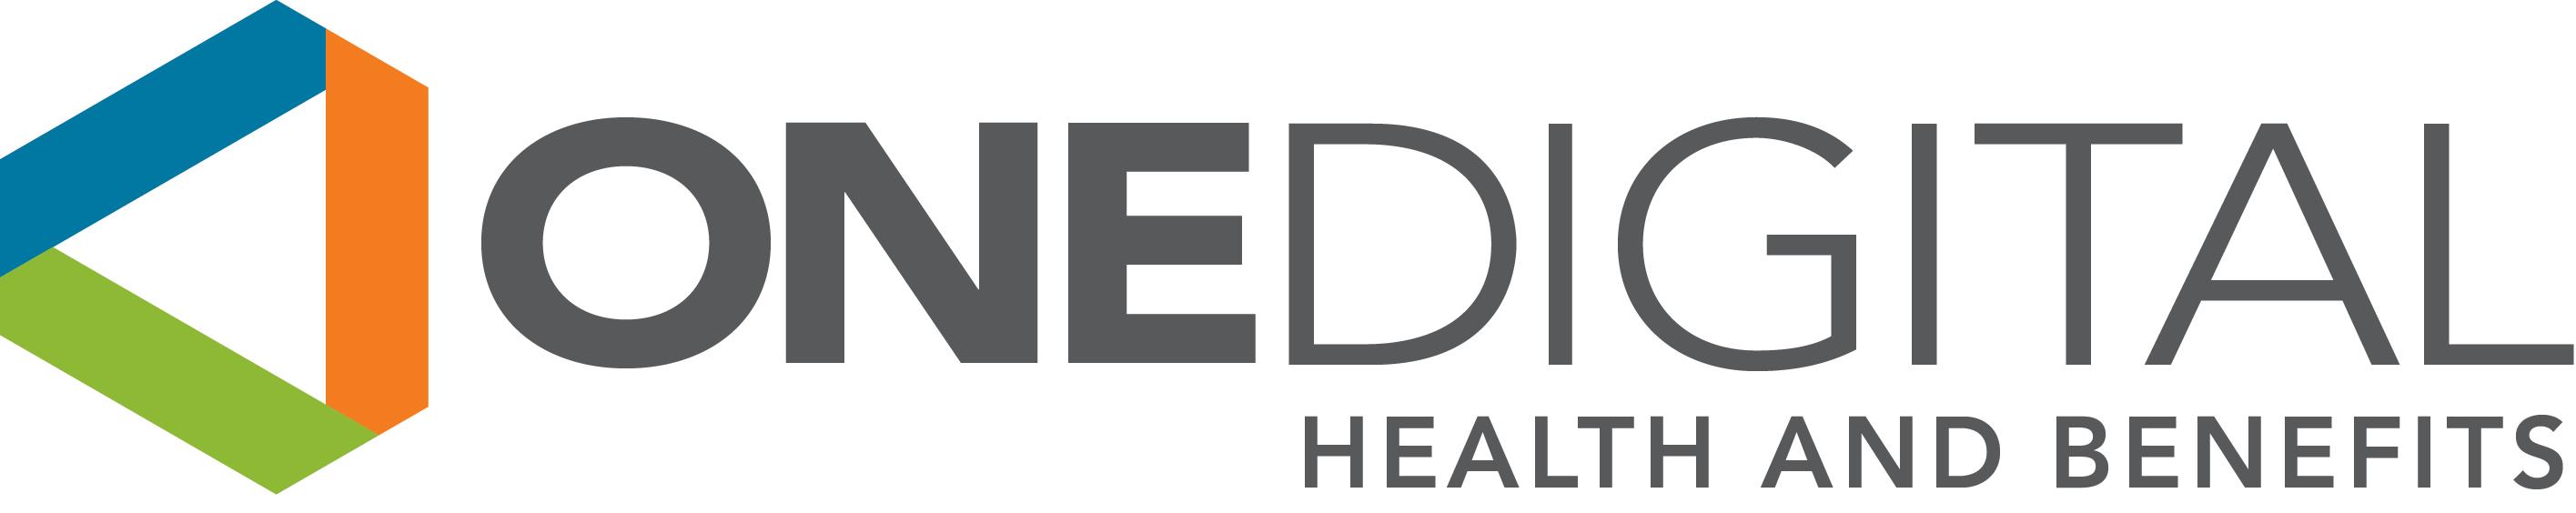 onedigital_logo_4color_HealthBenefitsTag